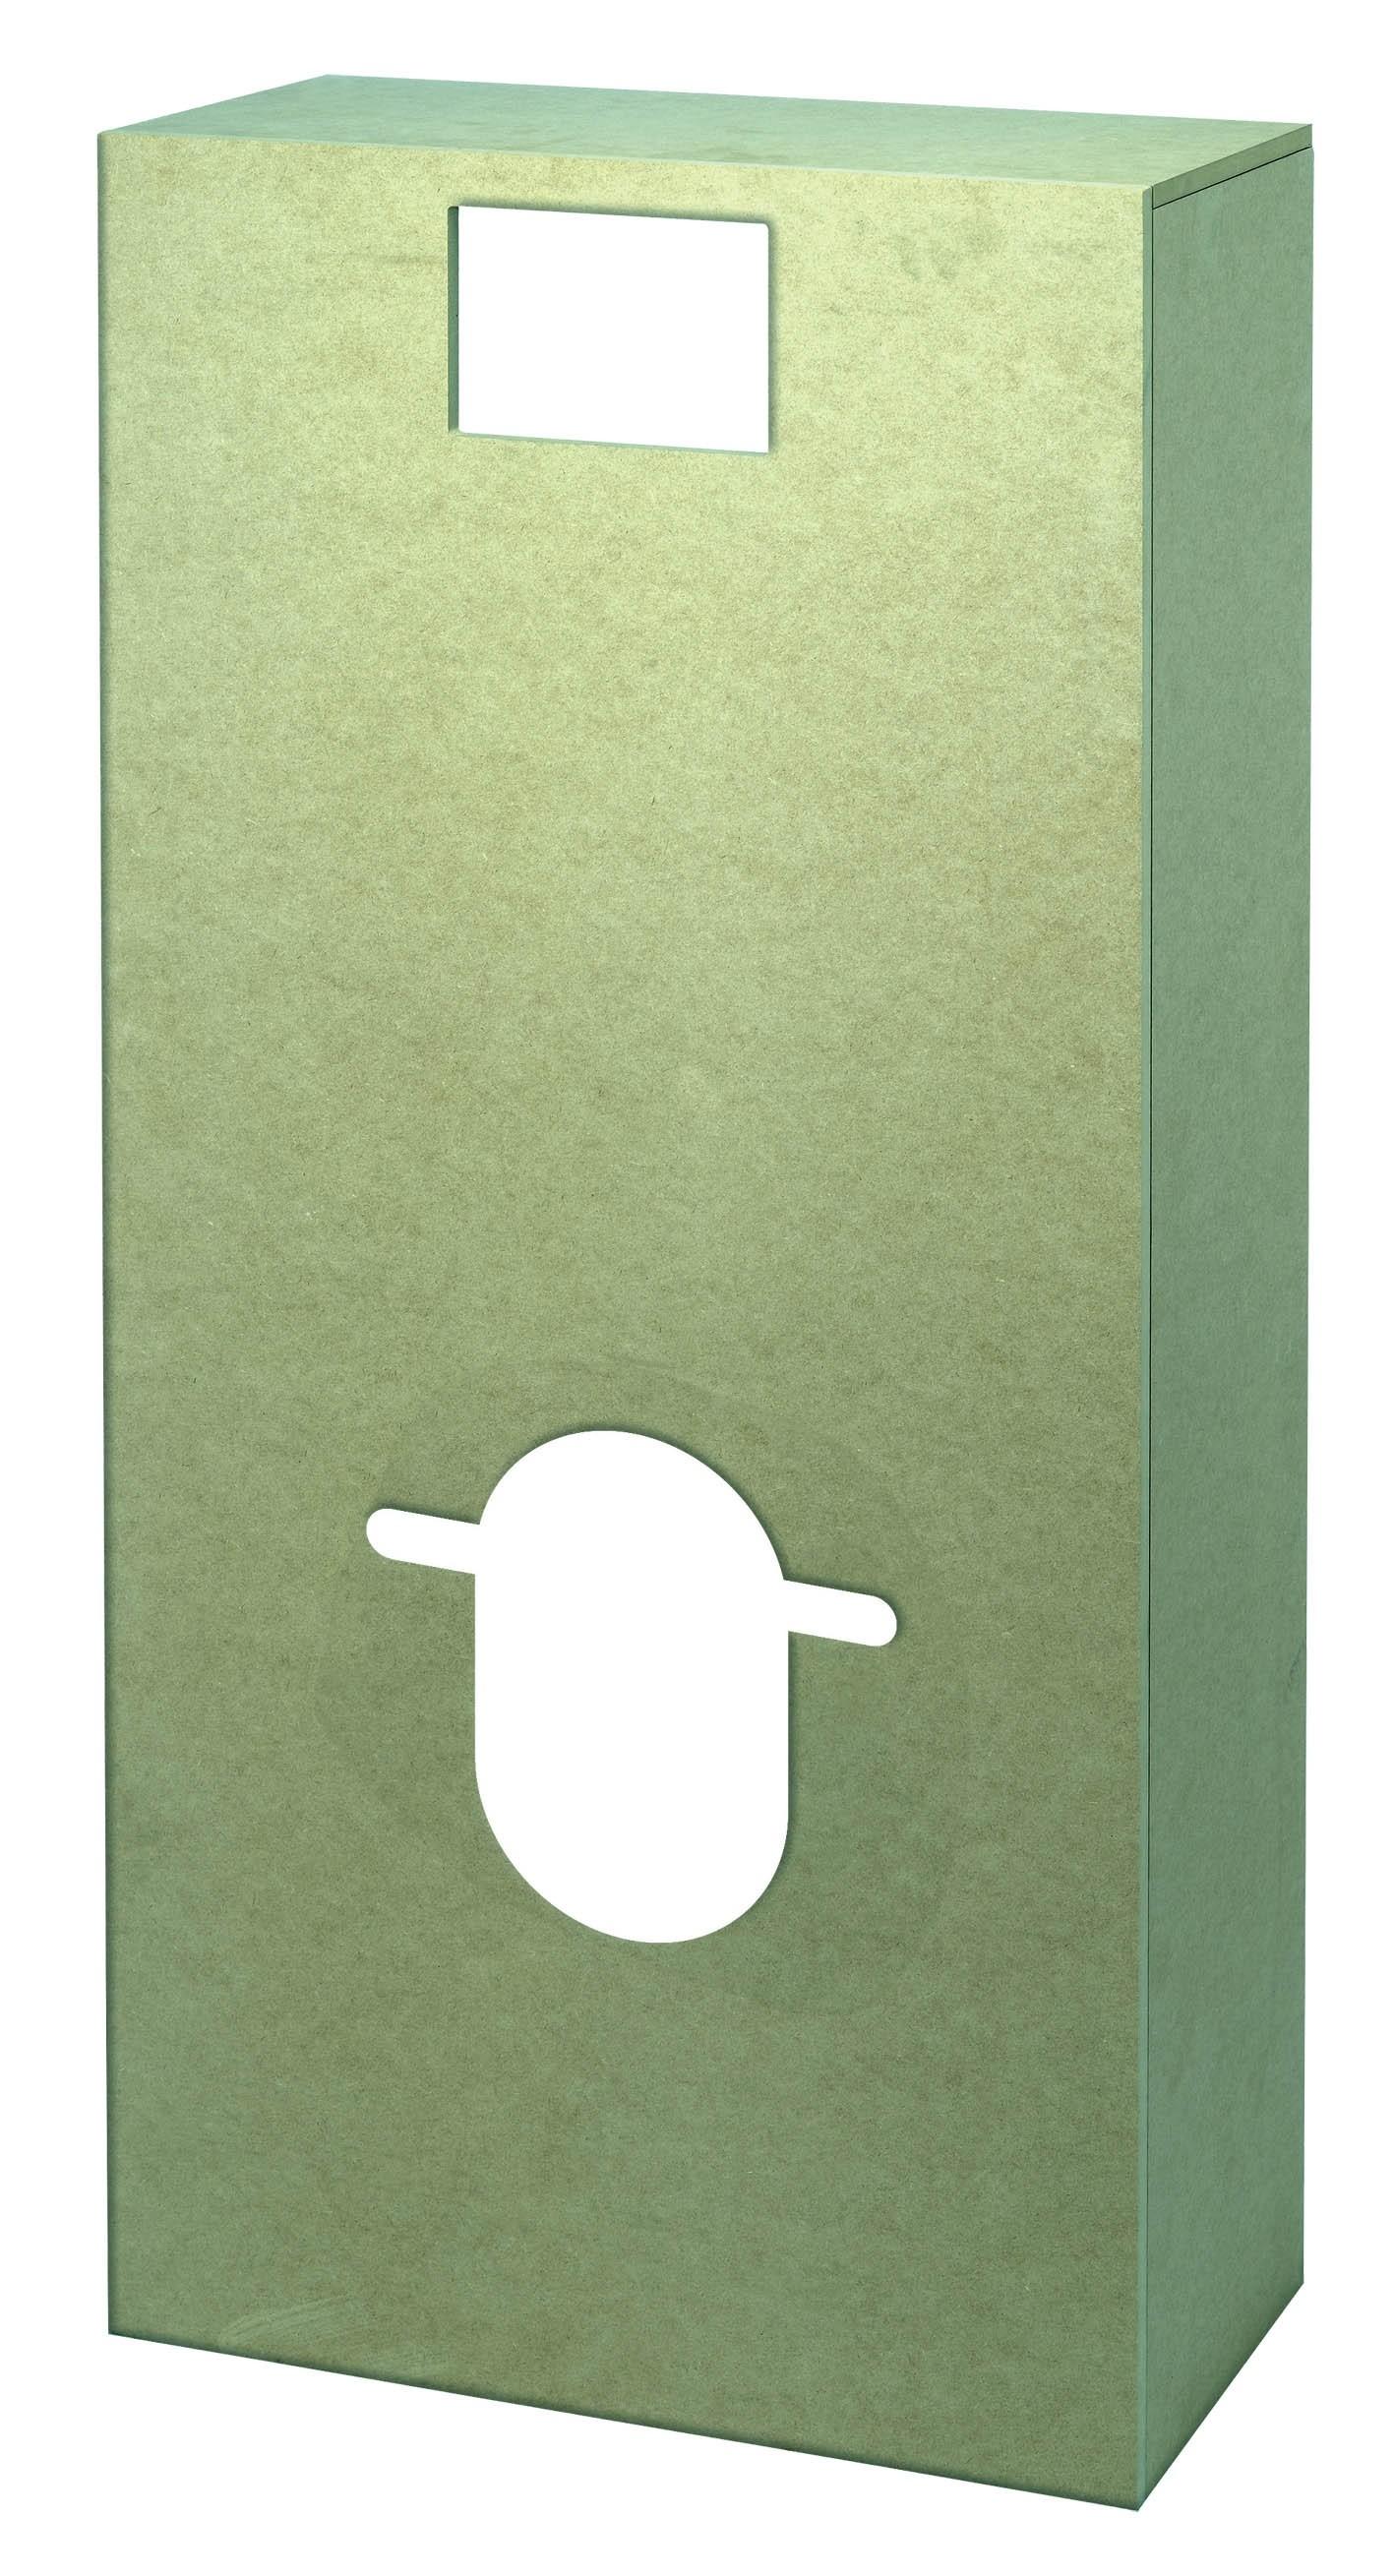 Coffrage Wc Suspendu Avec Rangement habillage hydrofugé pour wc suspendu wirquin - mr.bricolage